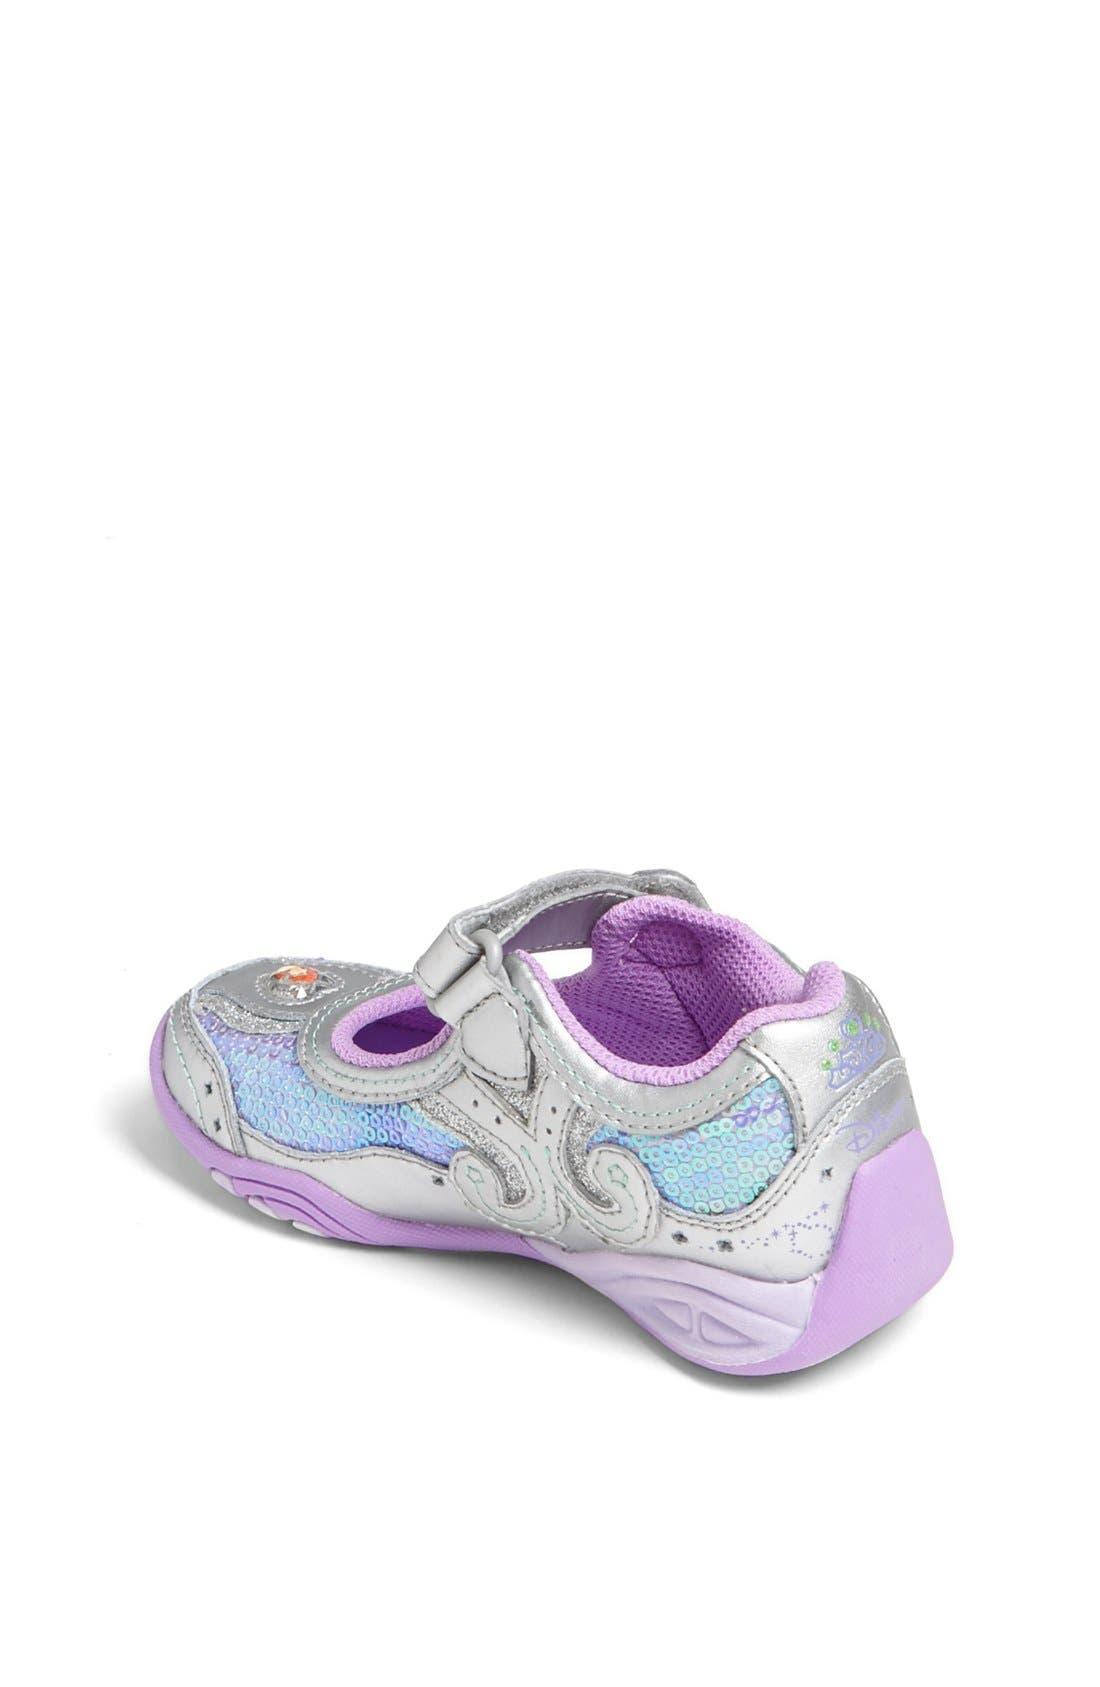 Alternate Image 2  - Stride Rite 'Disney Wish Lights  - Ariel'  Sneaker (Toddler & Little Kid)